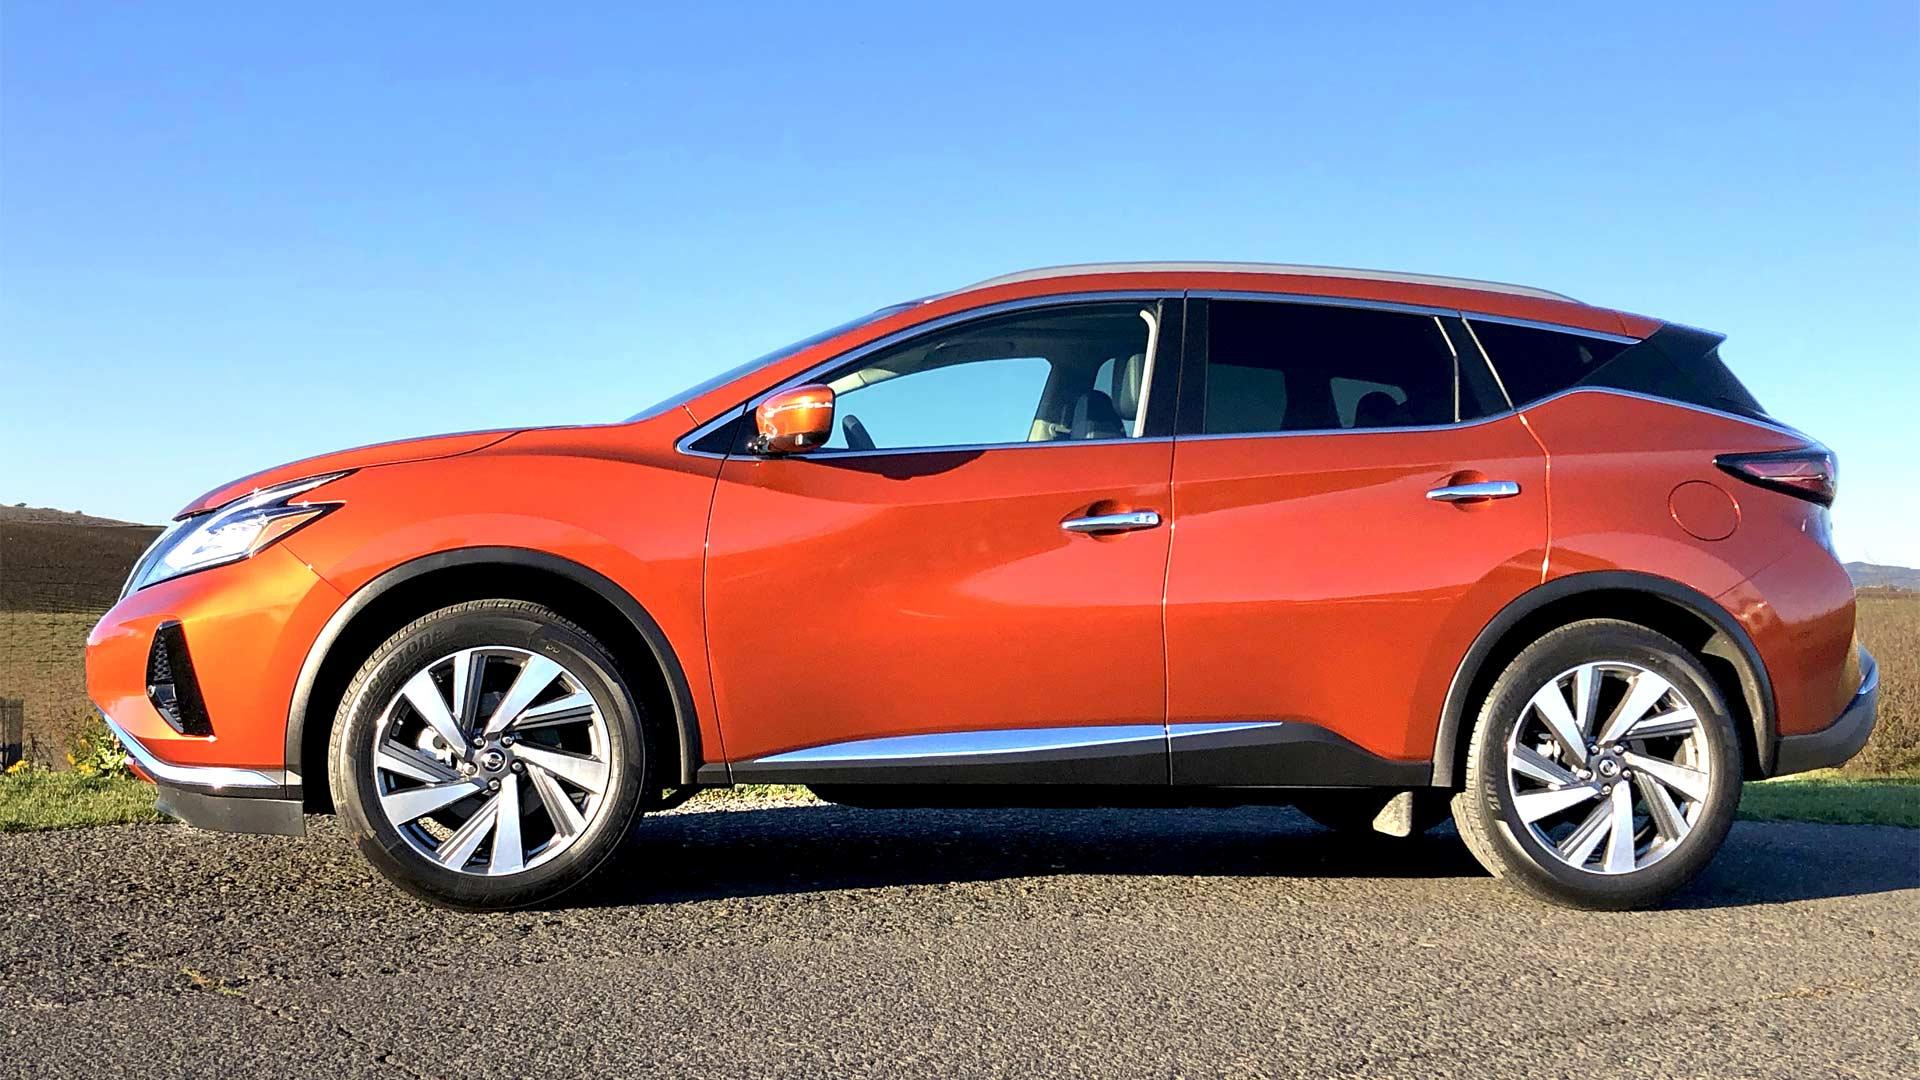 2019-Nissan-Murano-in-Sunset-Drift